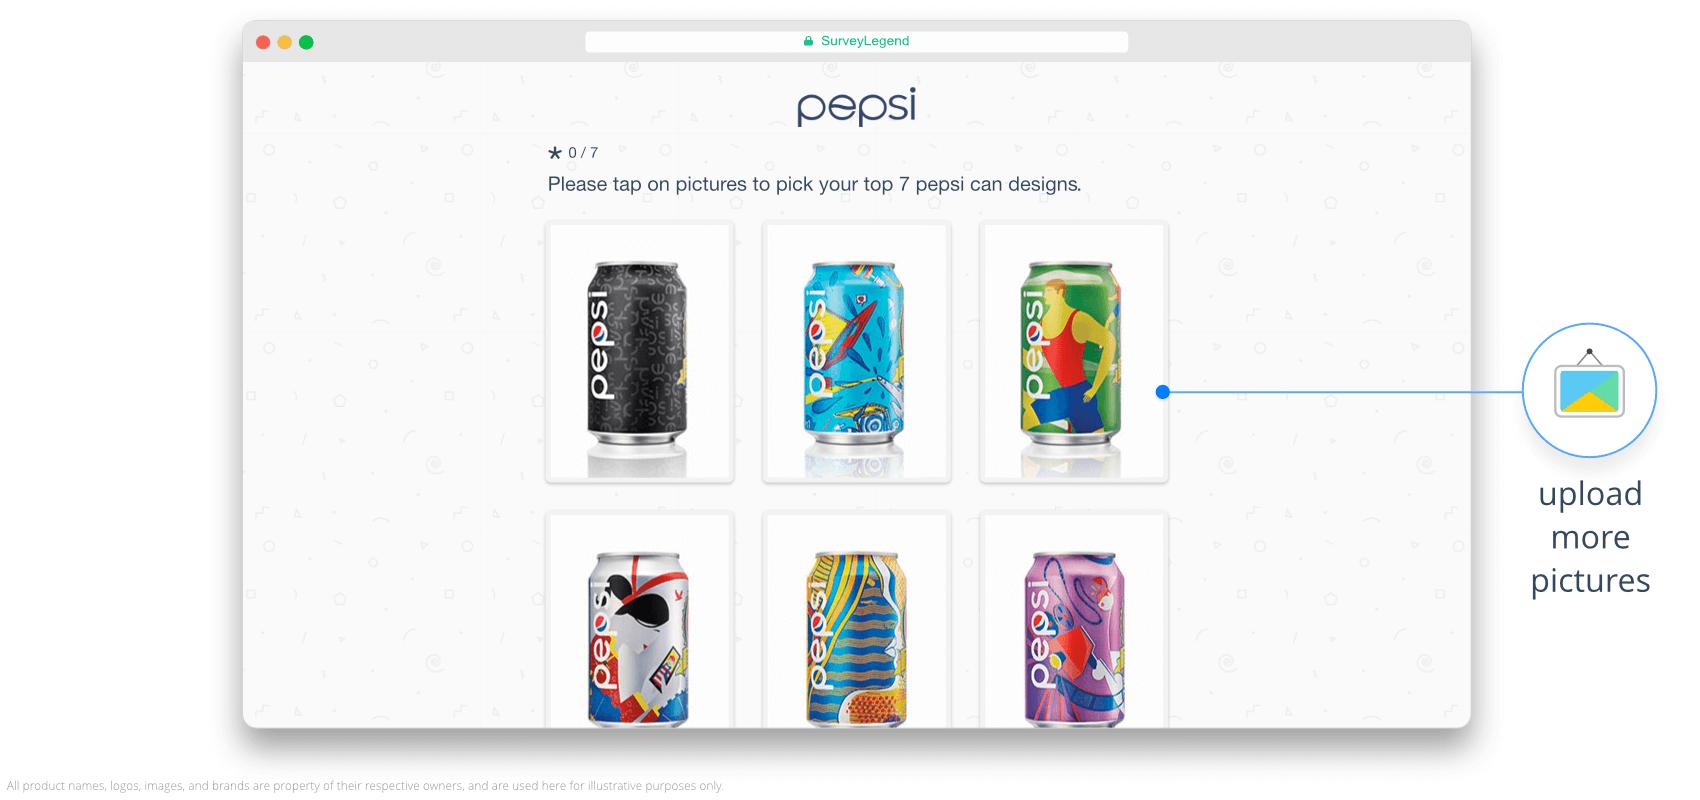 Packaging Design Research | SurveyLegend ®